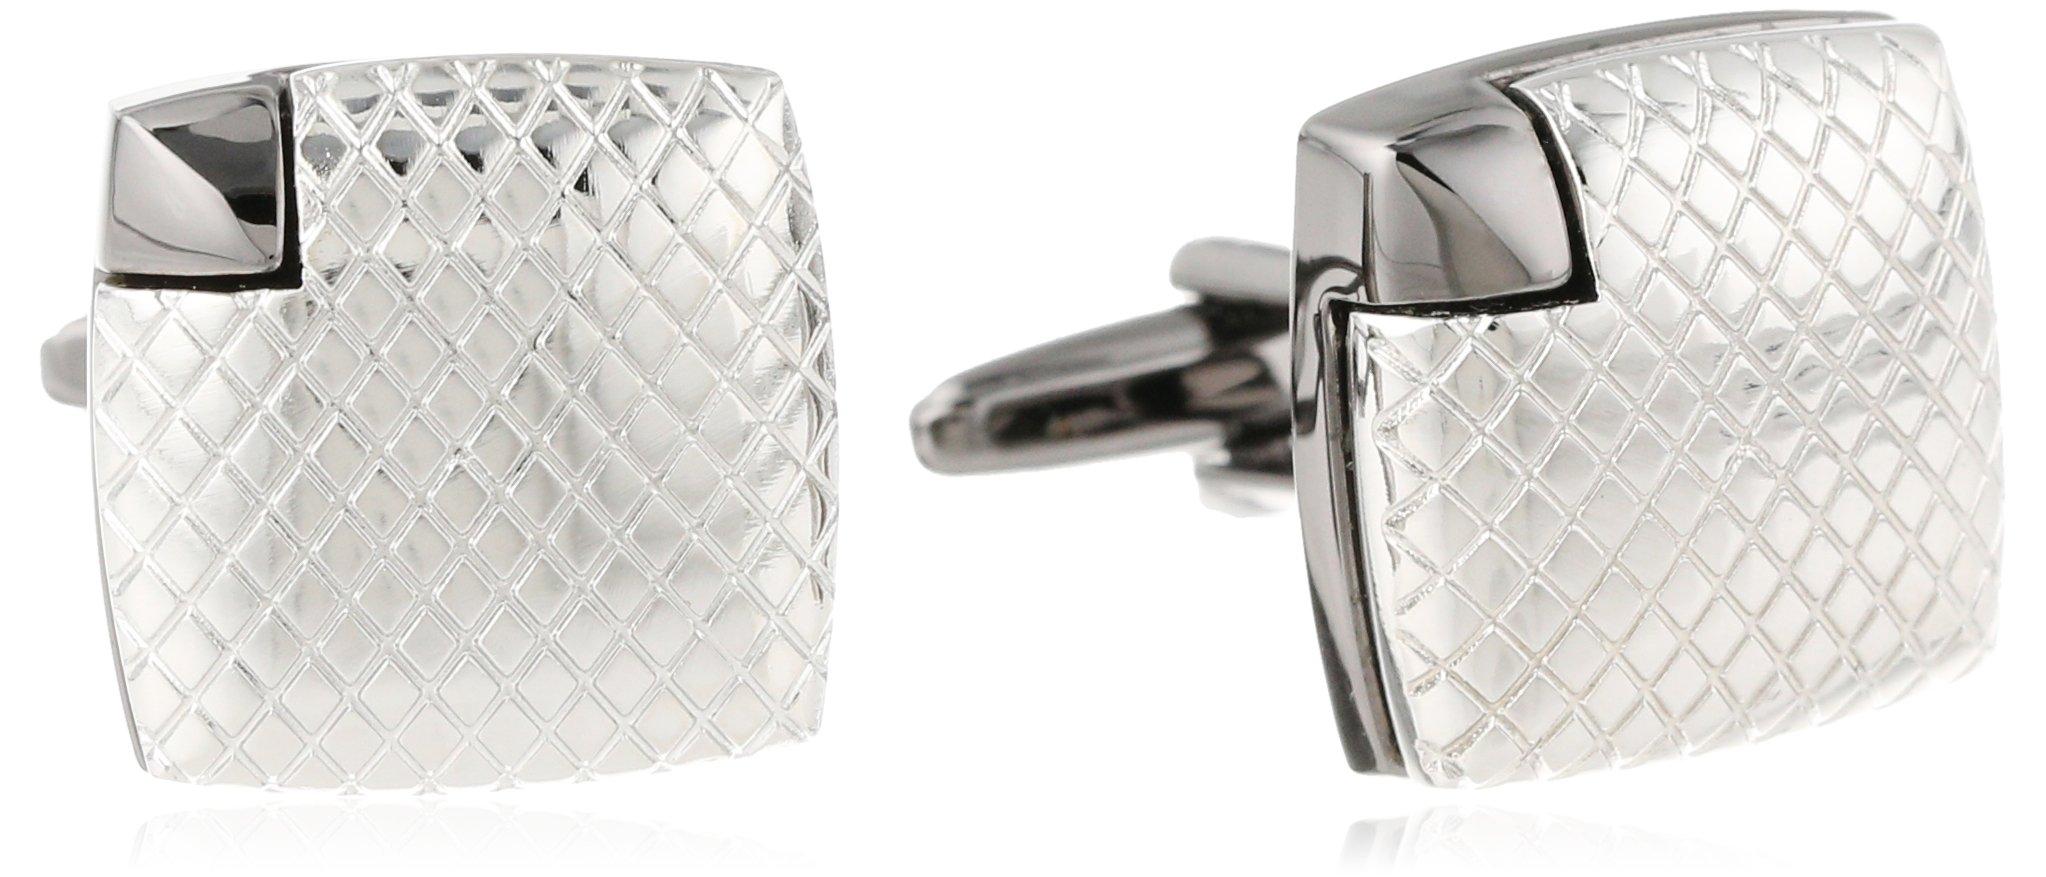 Stacy Adams Men's Cuff Link With Hematite Corner, Silver, One Size